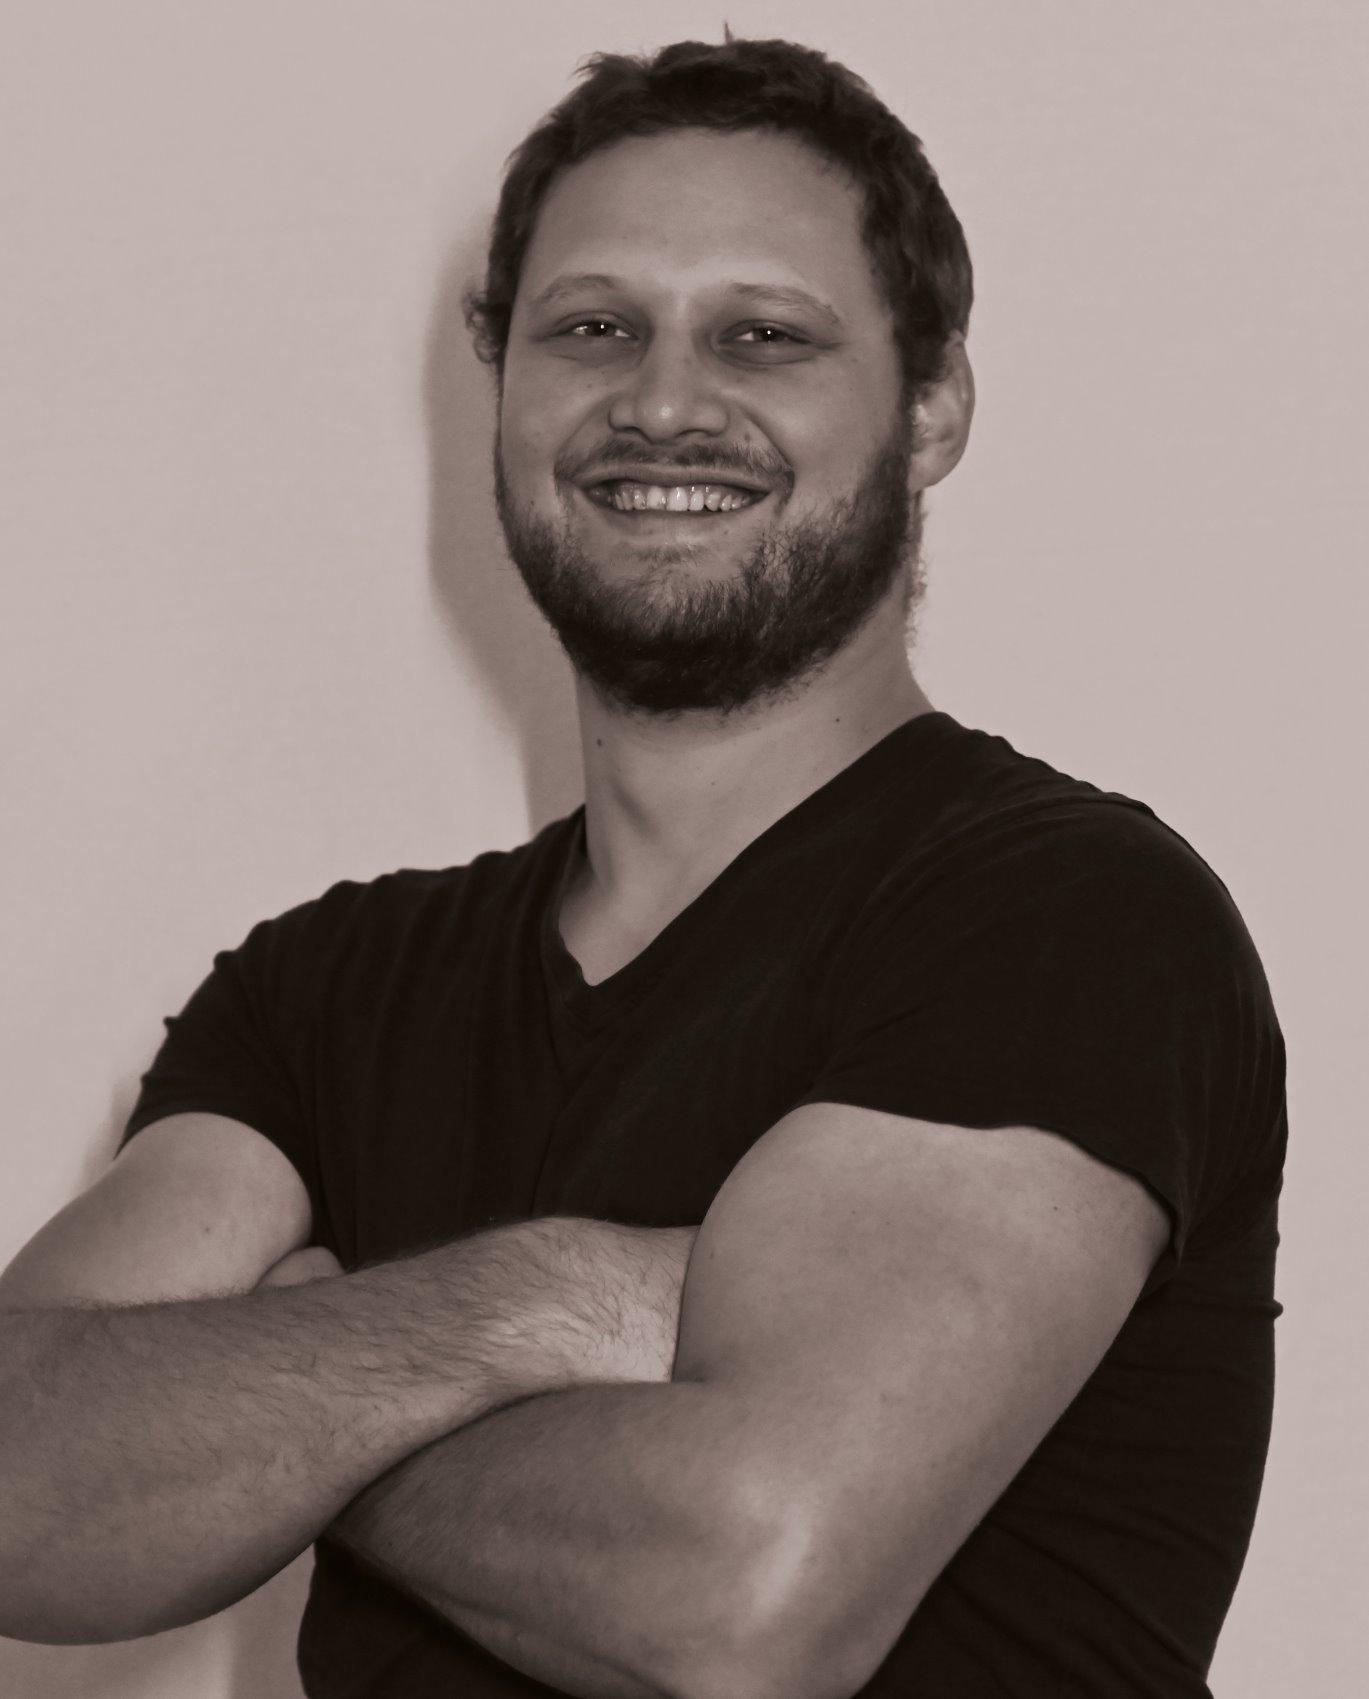 Georg Funk